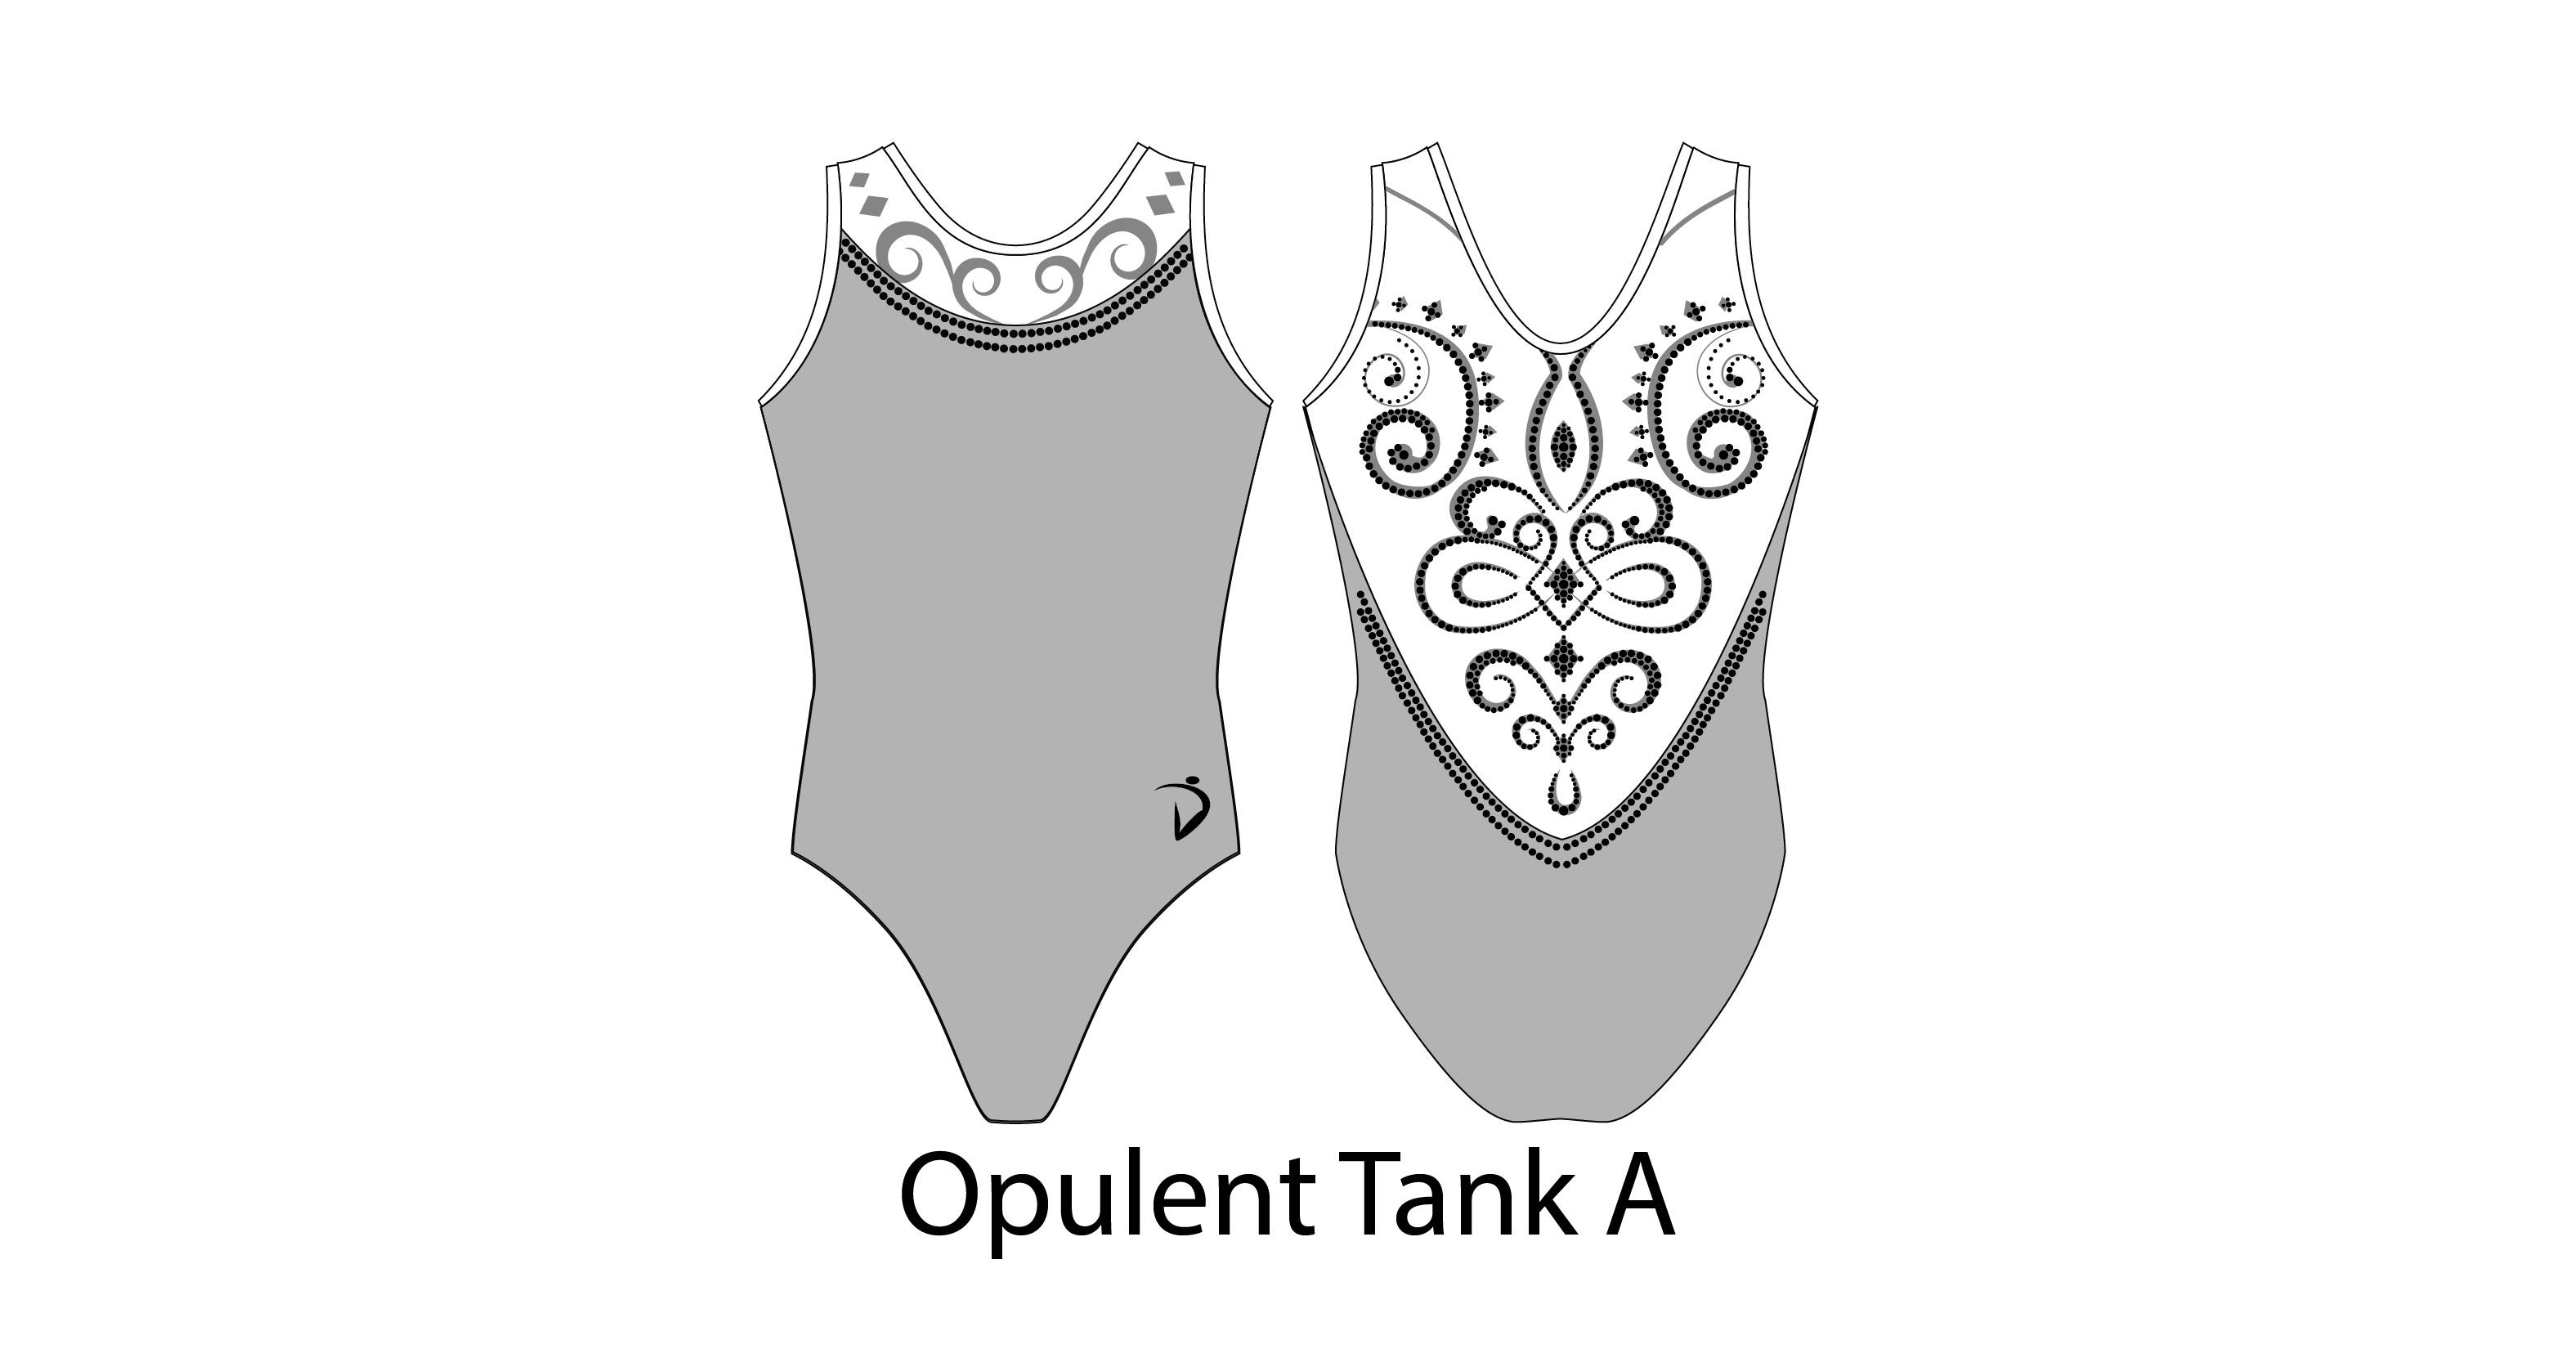 Opulent Tank A